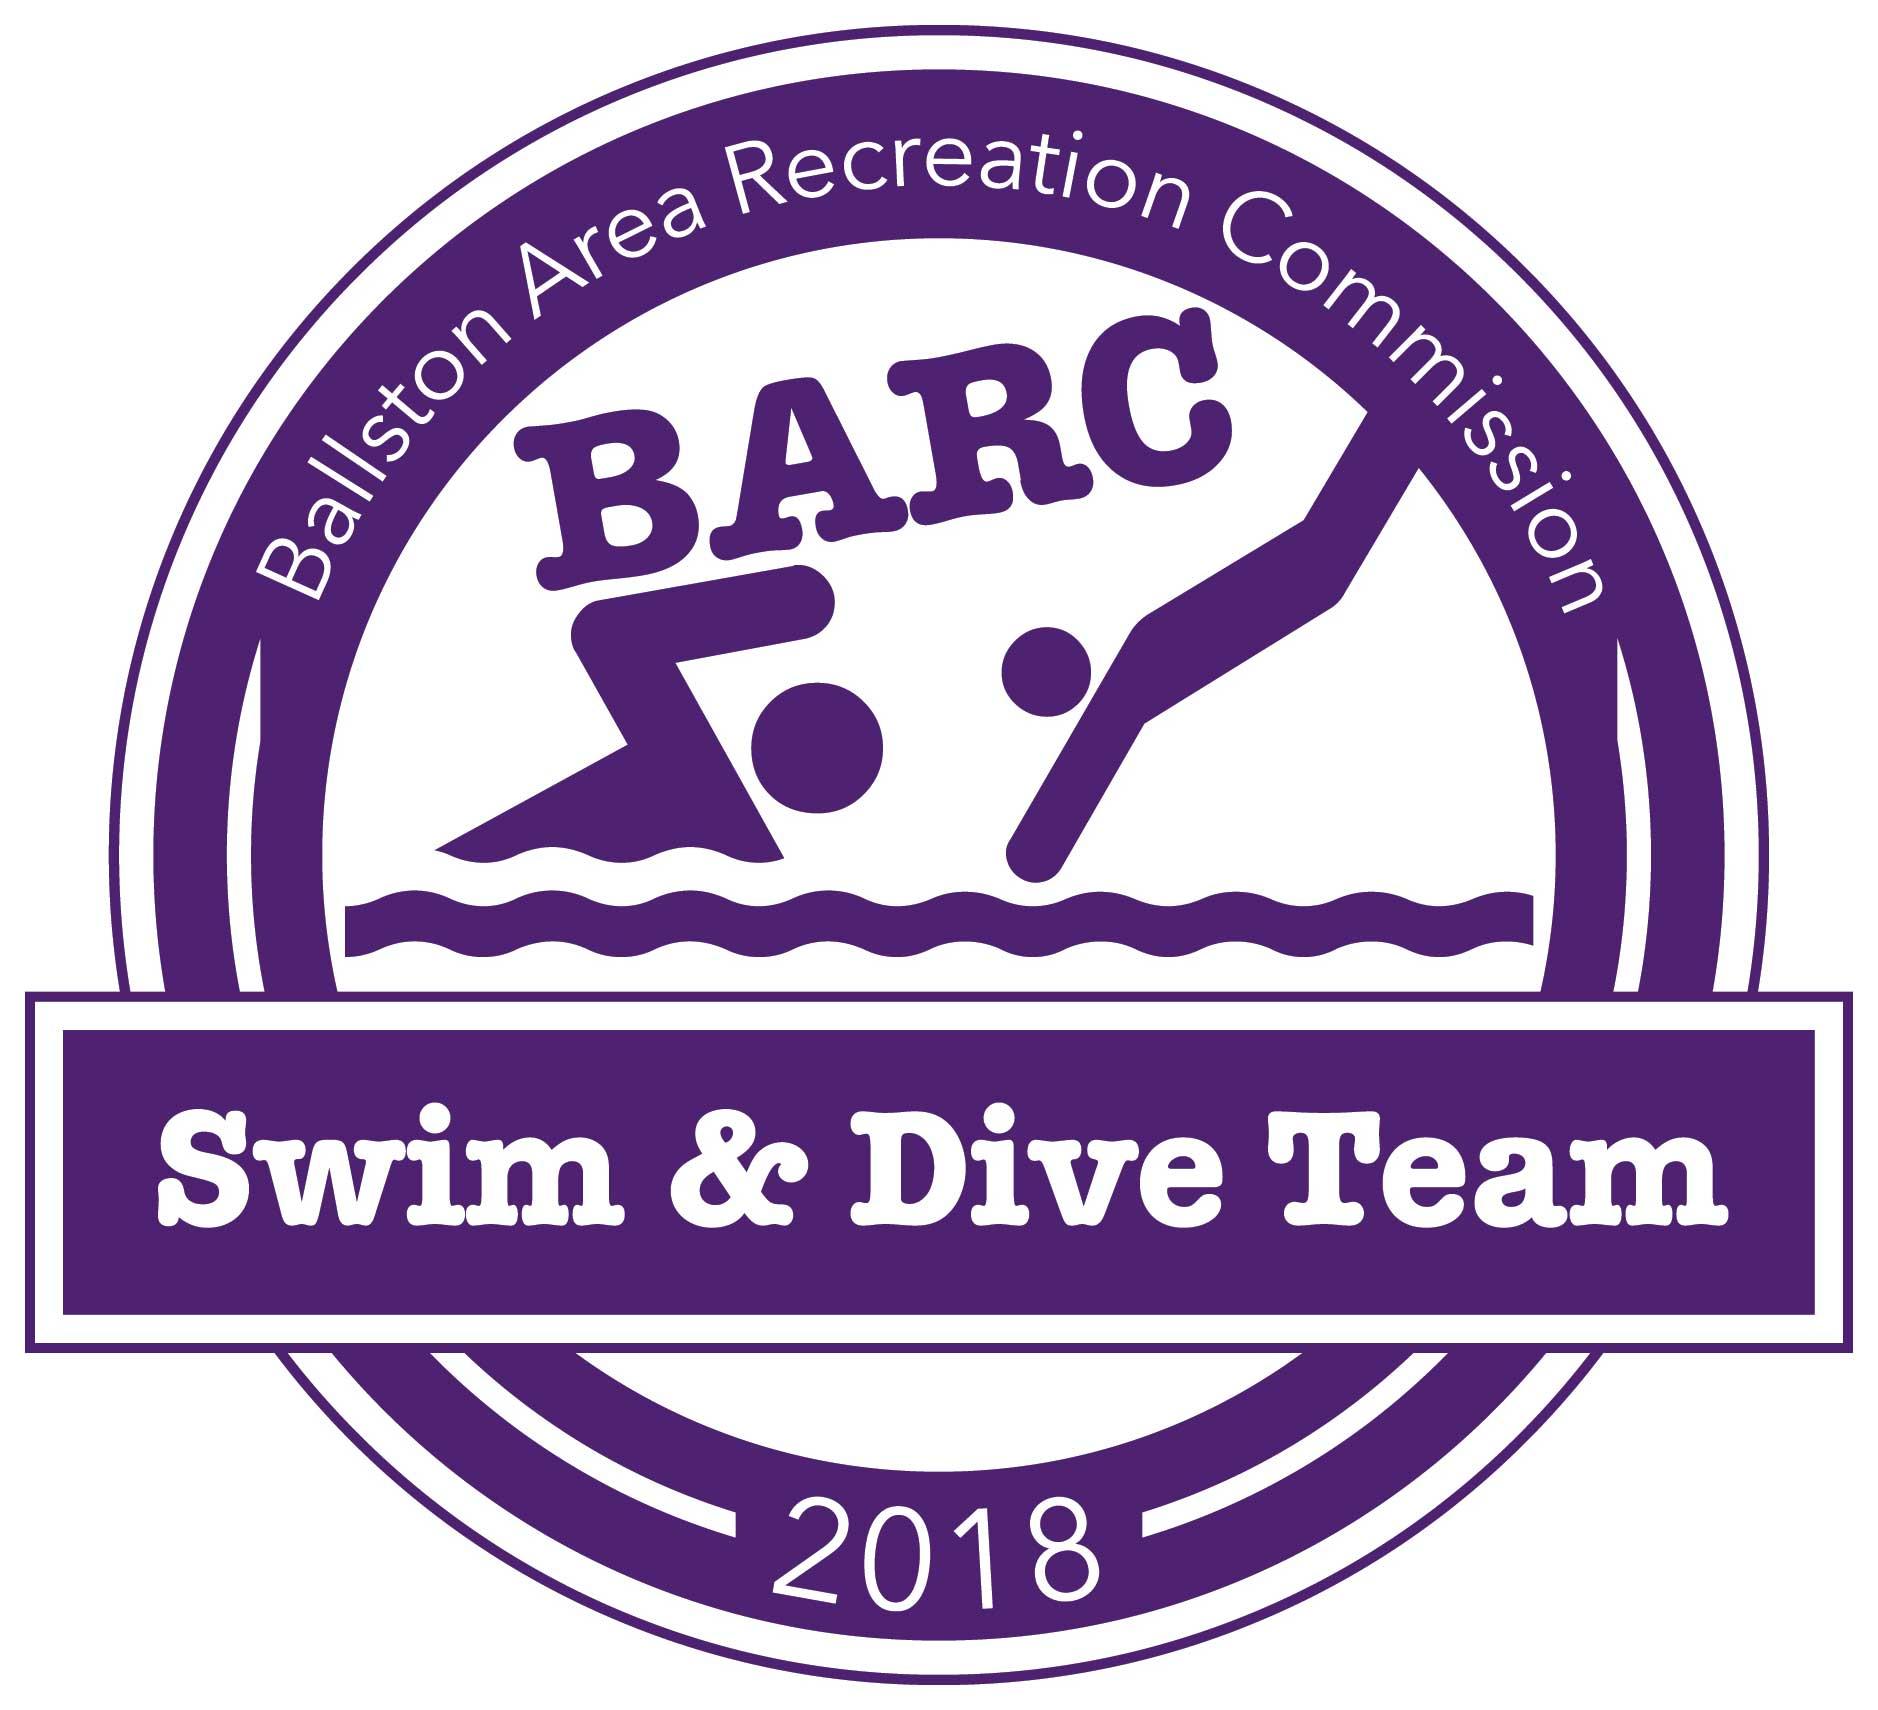 Ballston Area Recreation Commission Swim and Dive Team Logo.